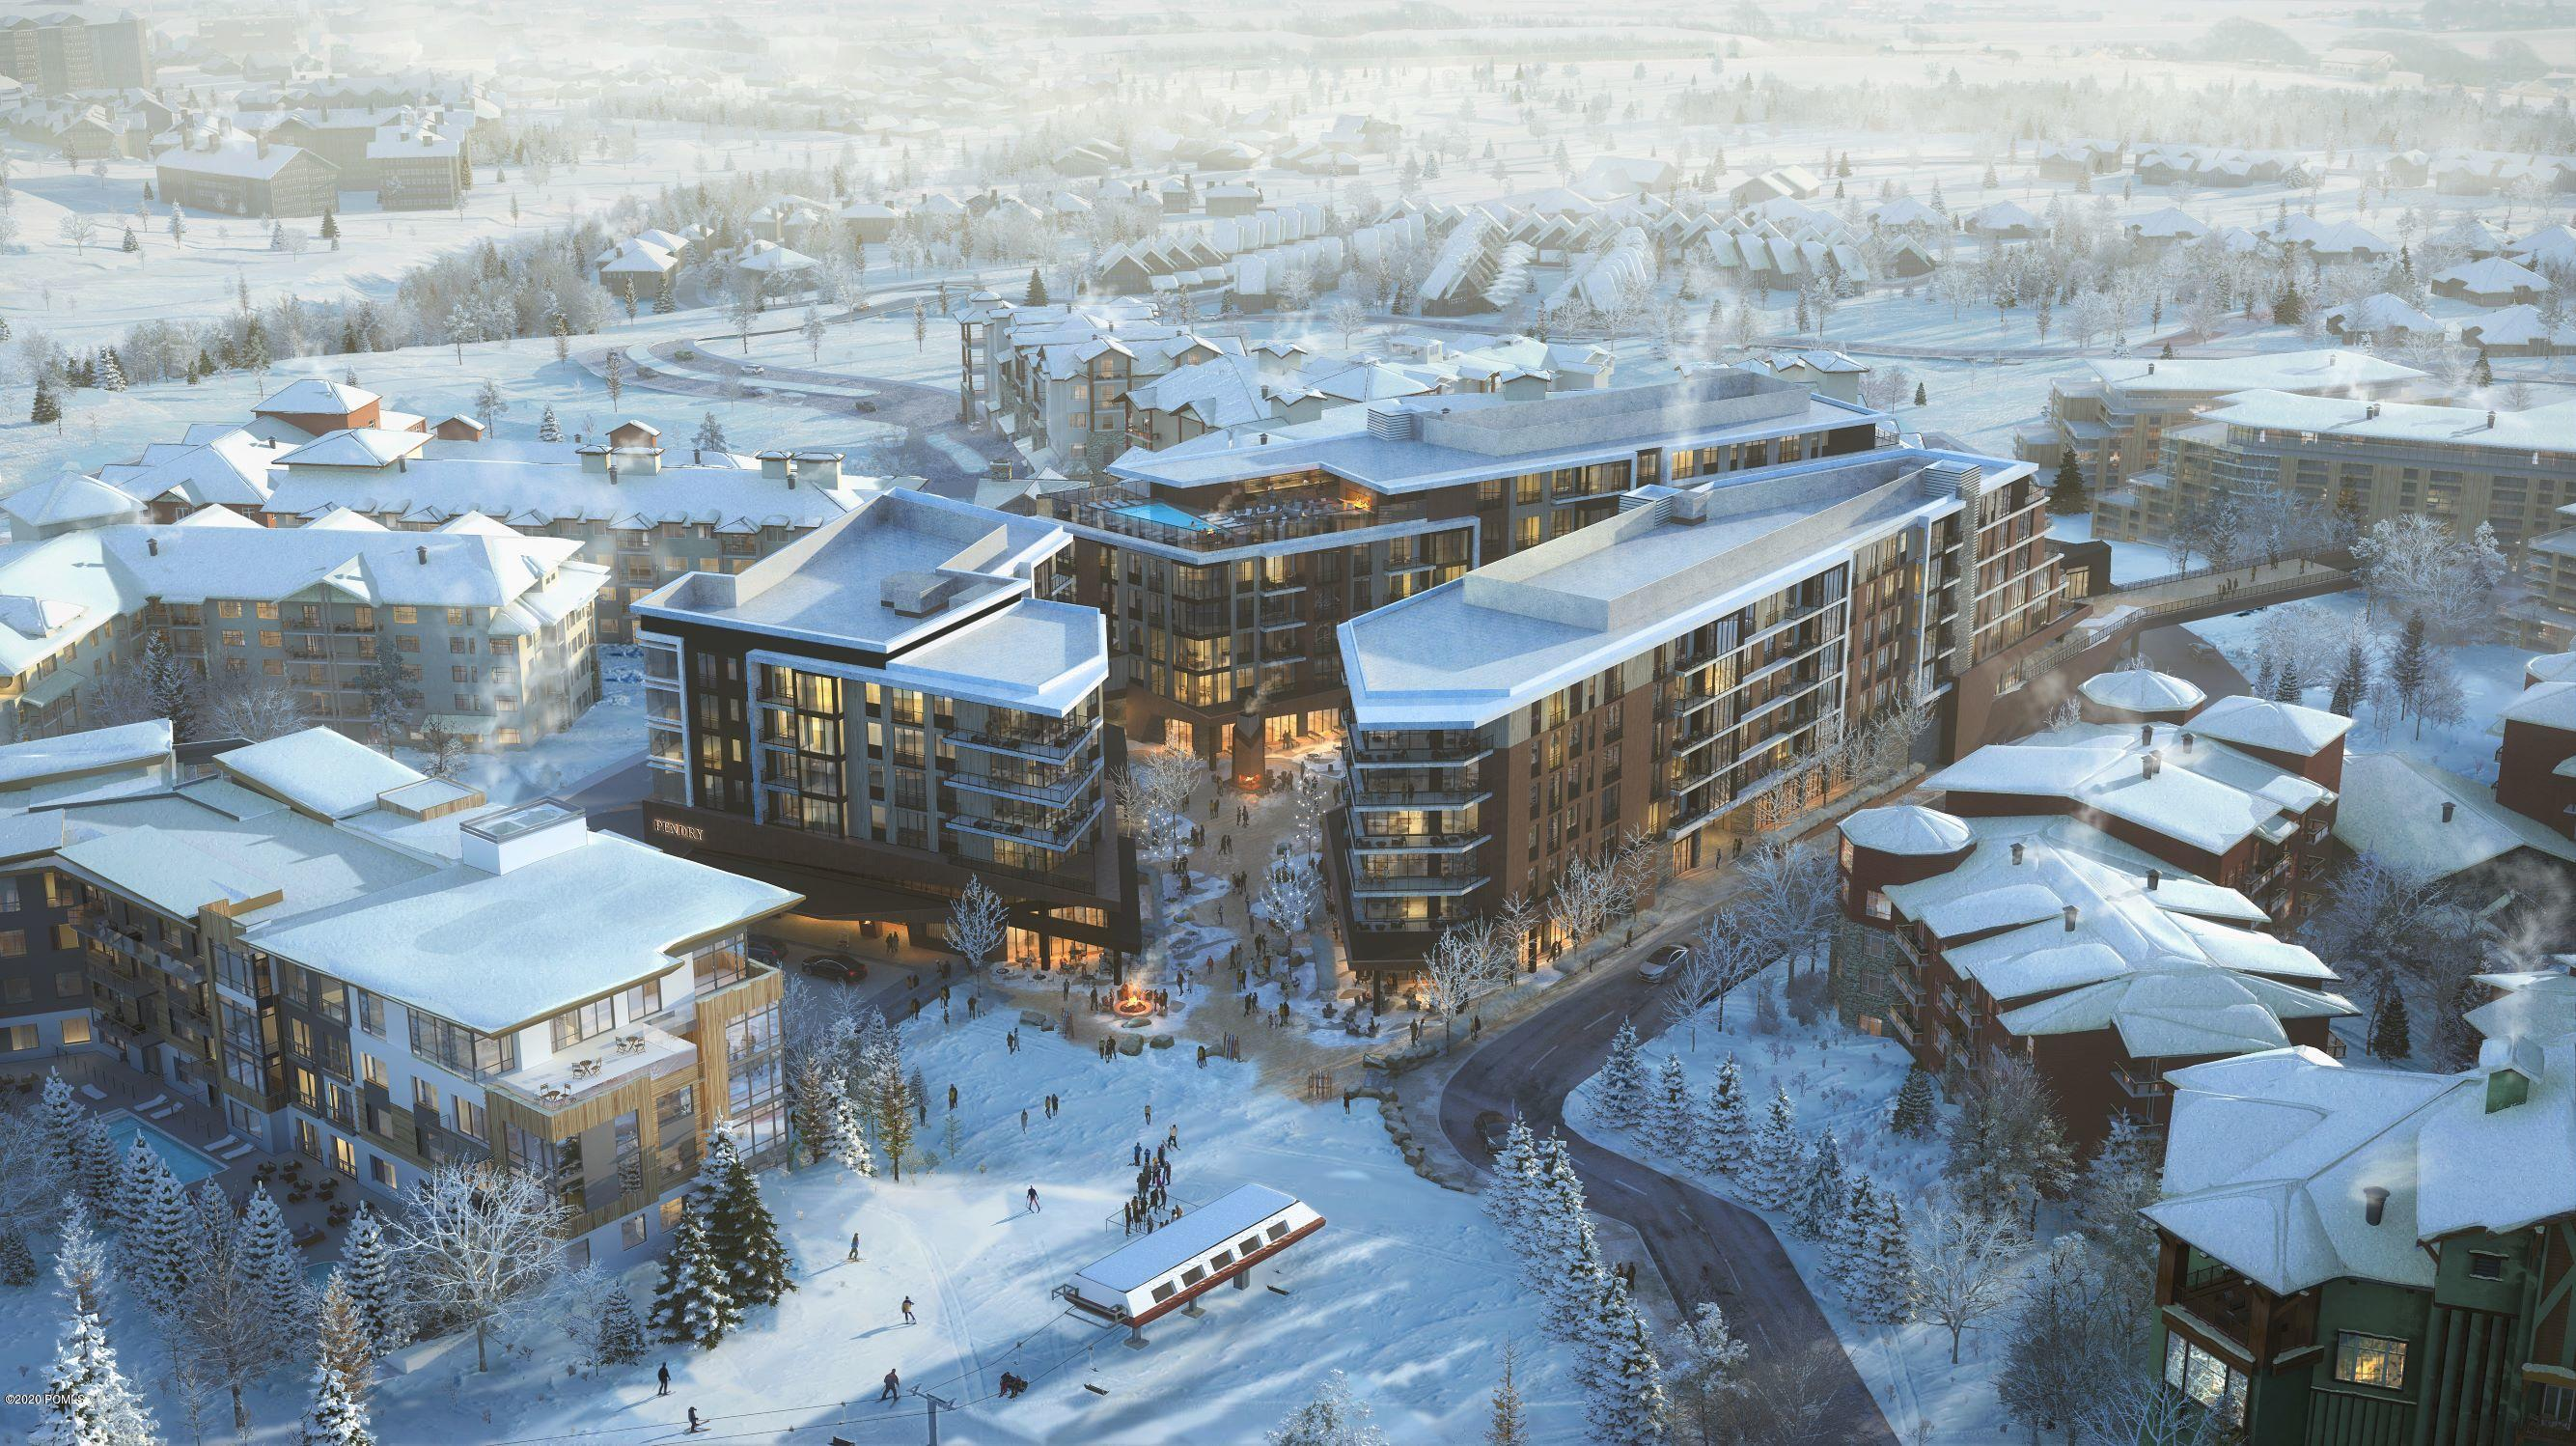 2417 High Mountain Road, Park City, Utah 84098, 1 Bedroom Bedrooms, ,1 BathroomBathrooms,Condominium,For Sale,High Mountain,12004376